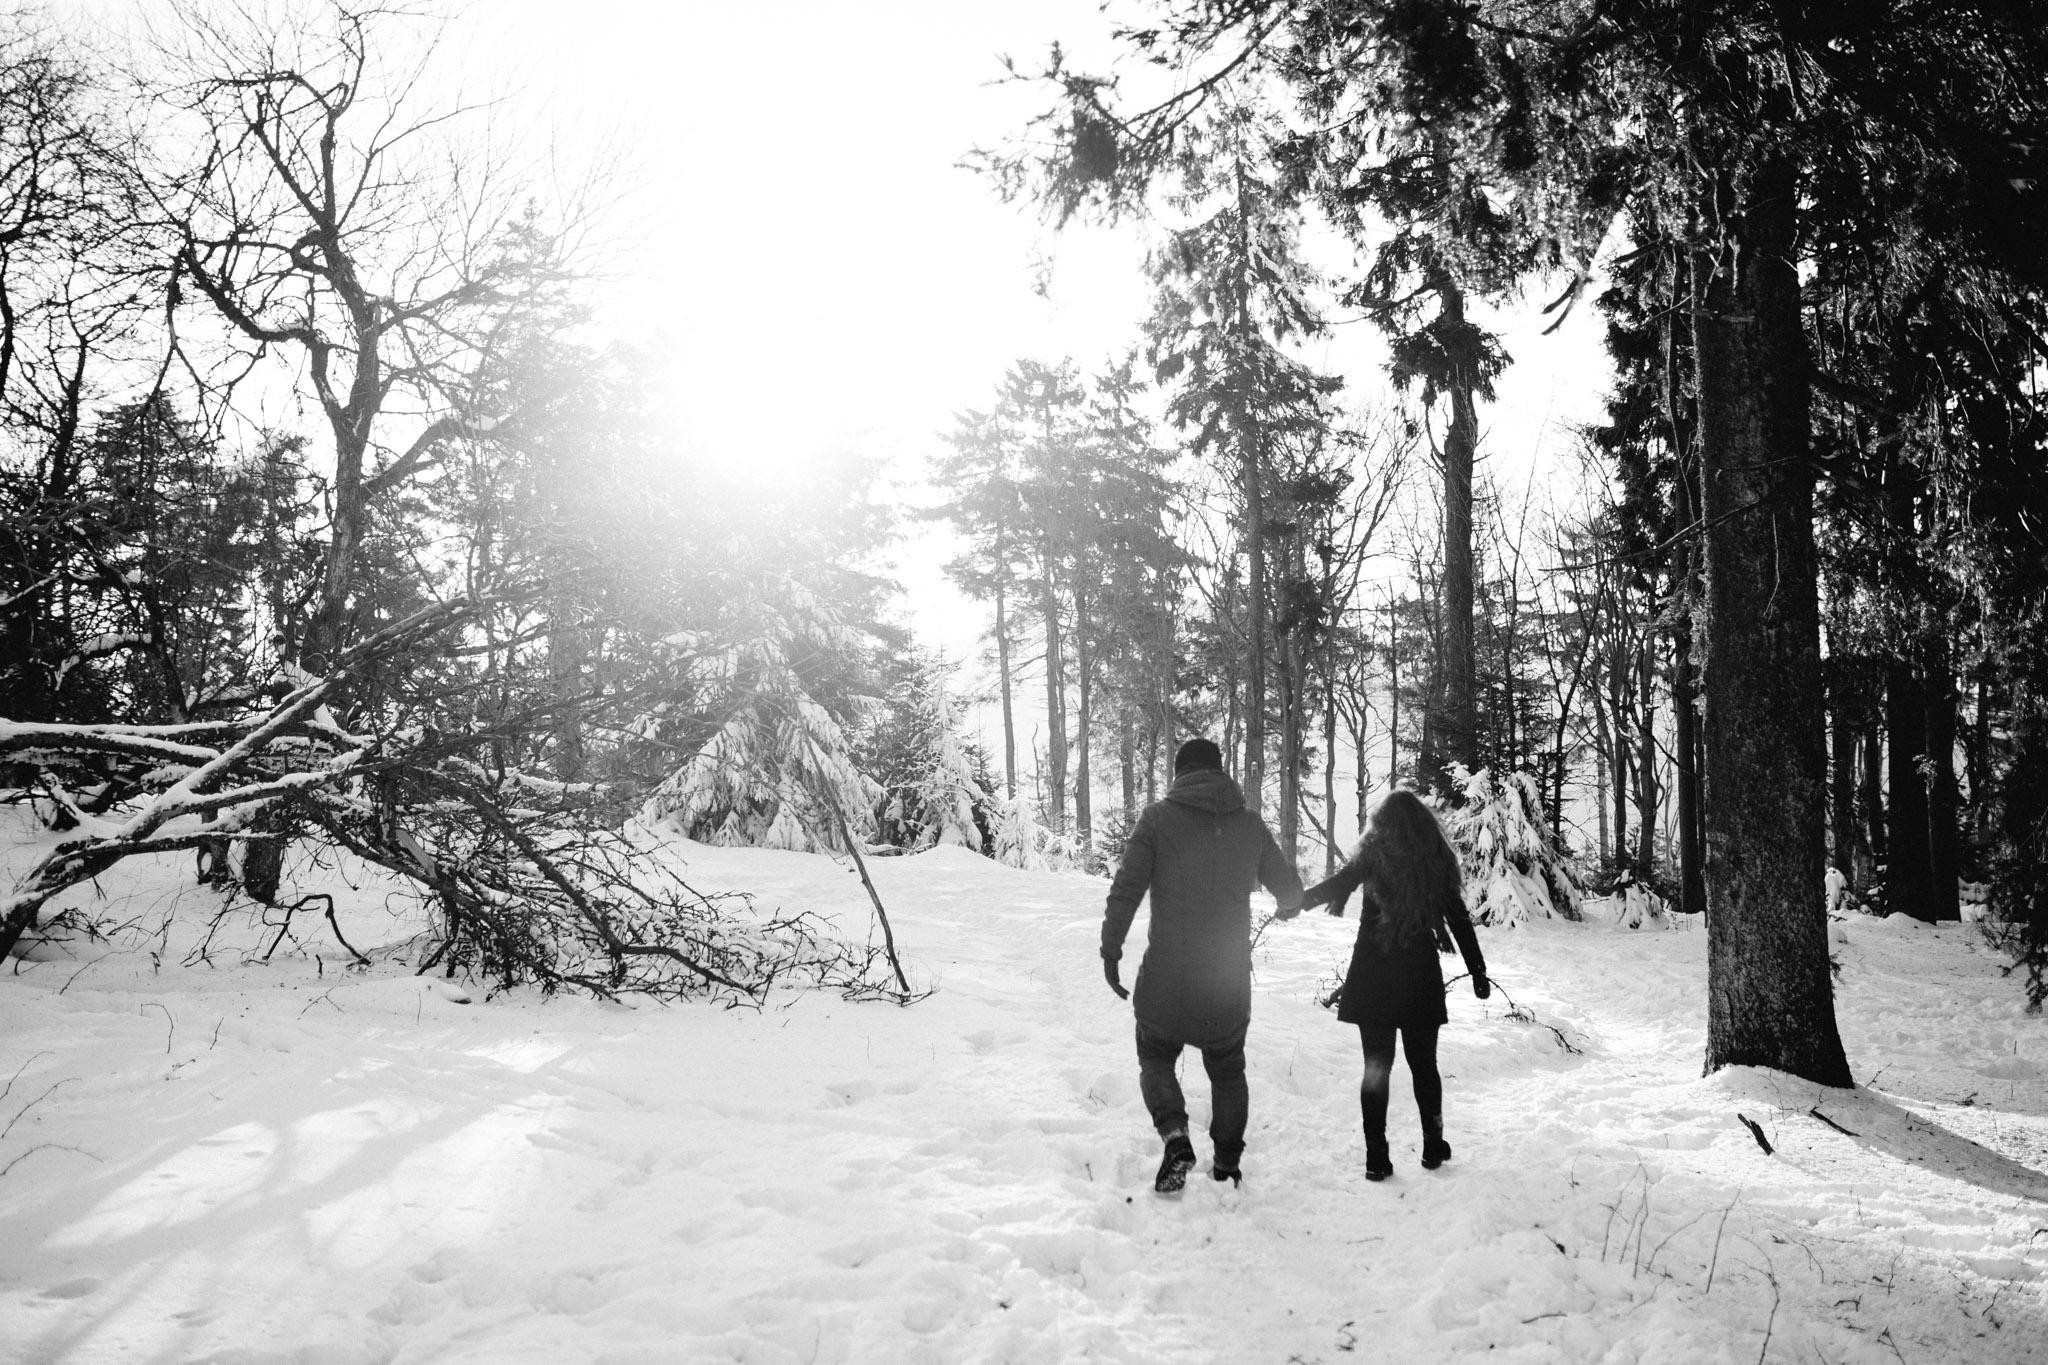 Grosser-Feldberg-Frankfurt-Engagement-Pia-Anna-Christian-Wedding-Photography-SE-6.jpg